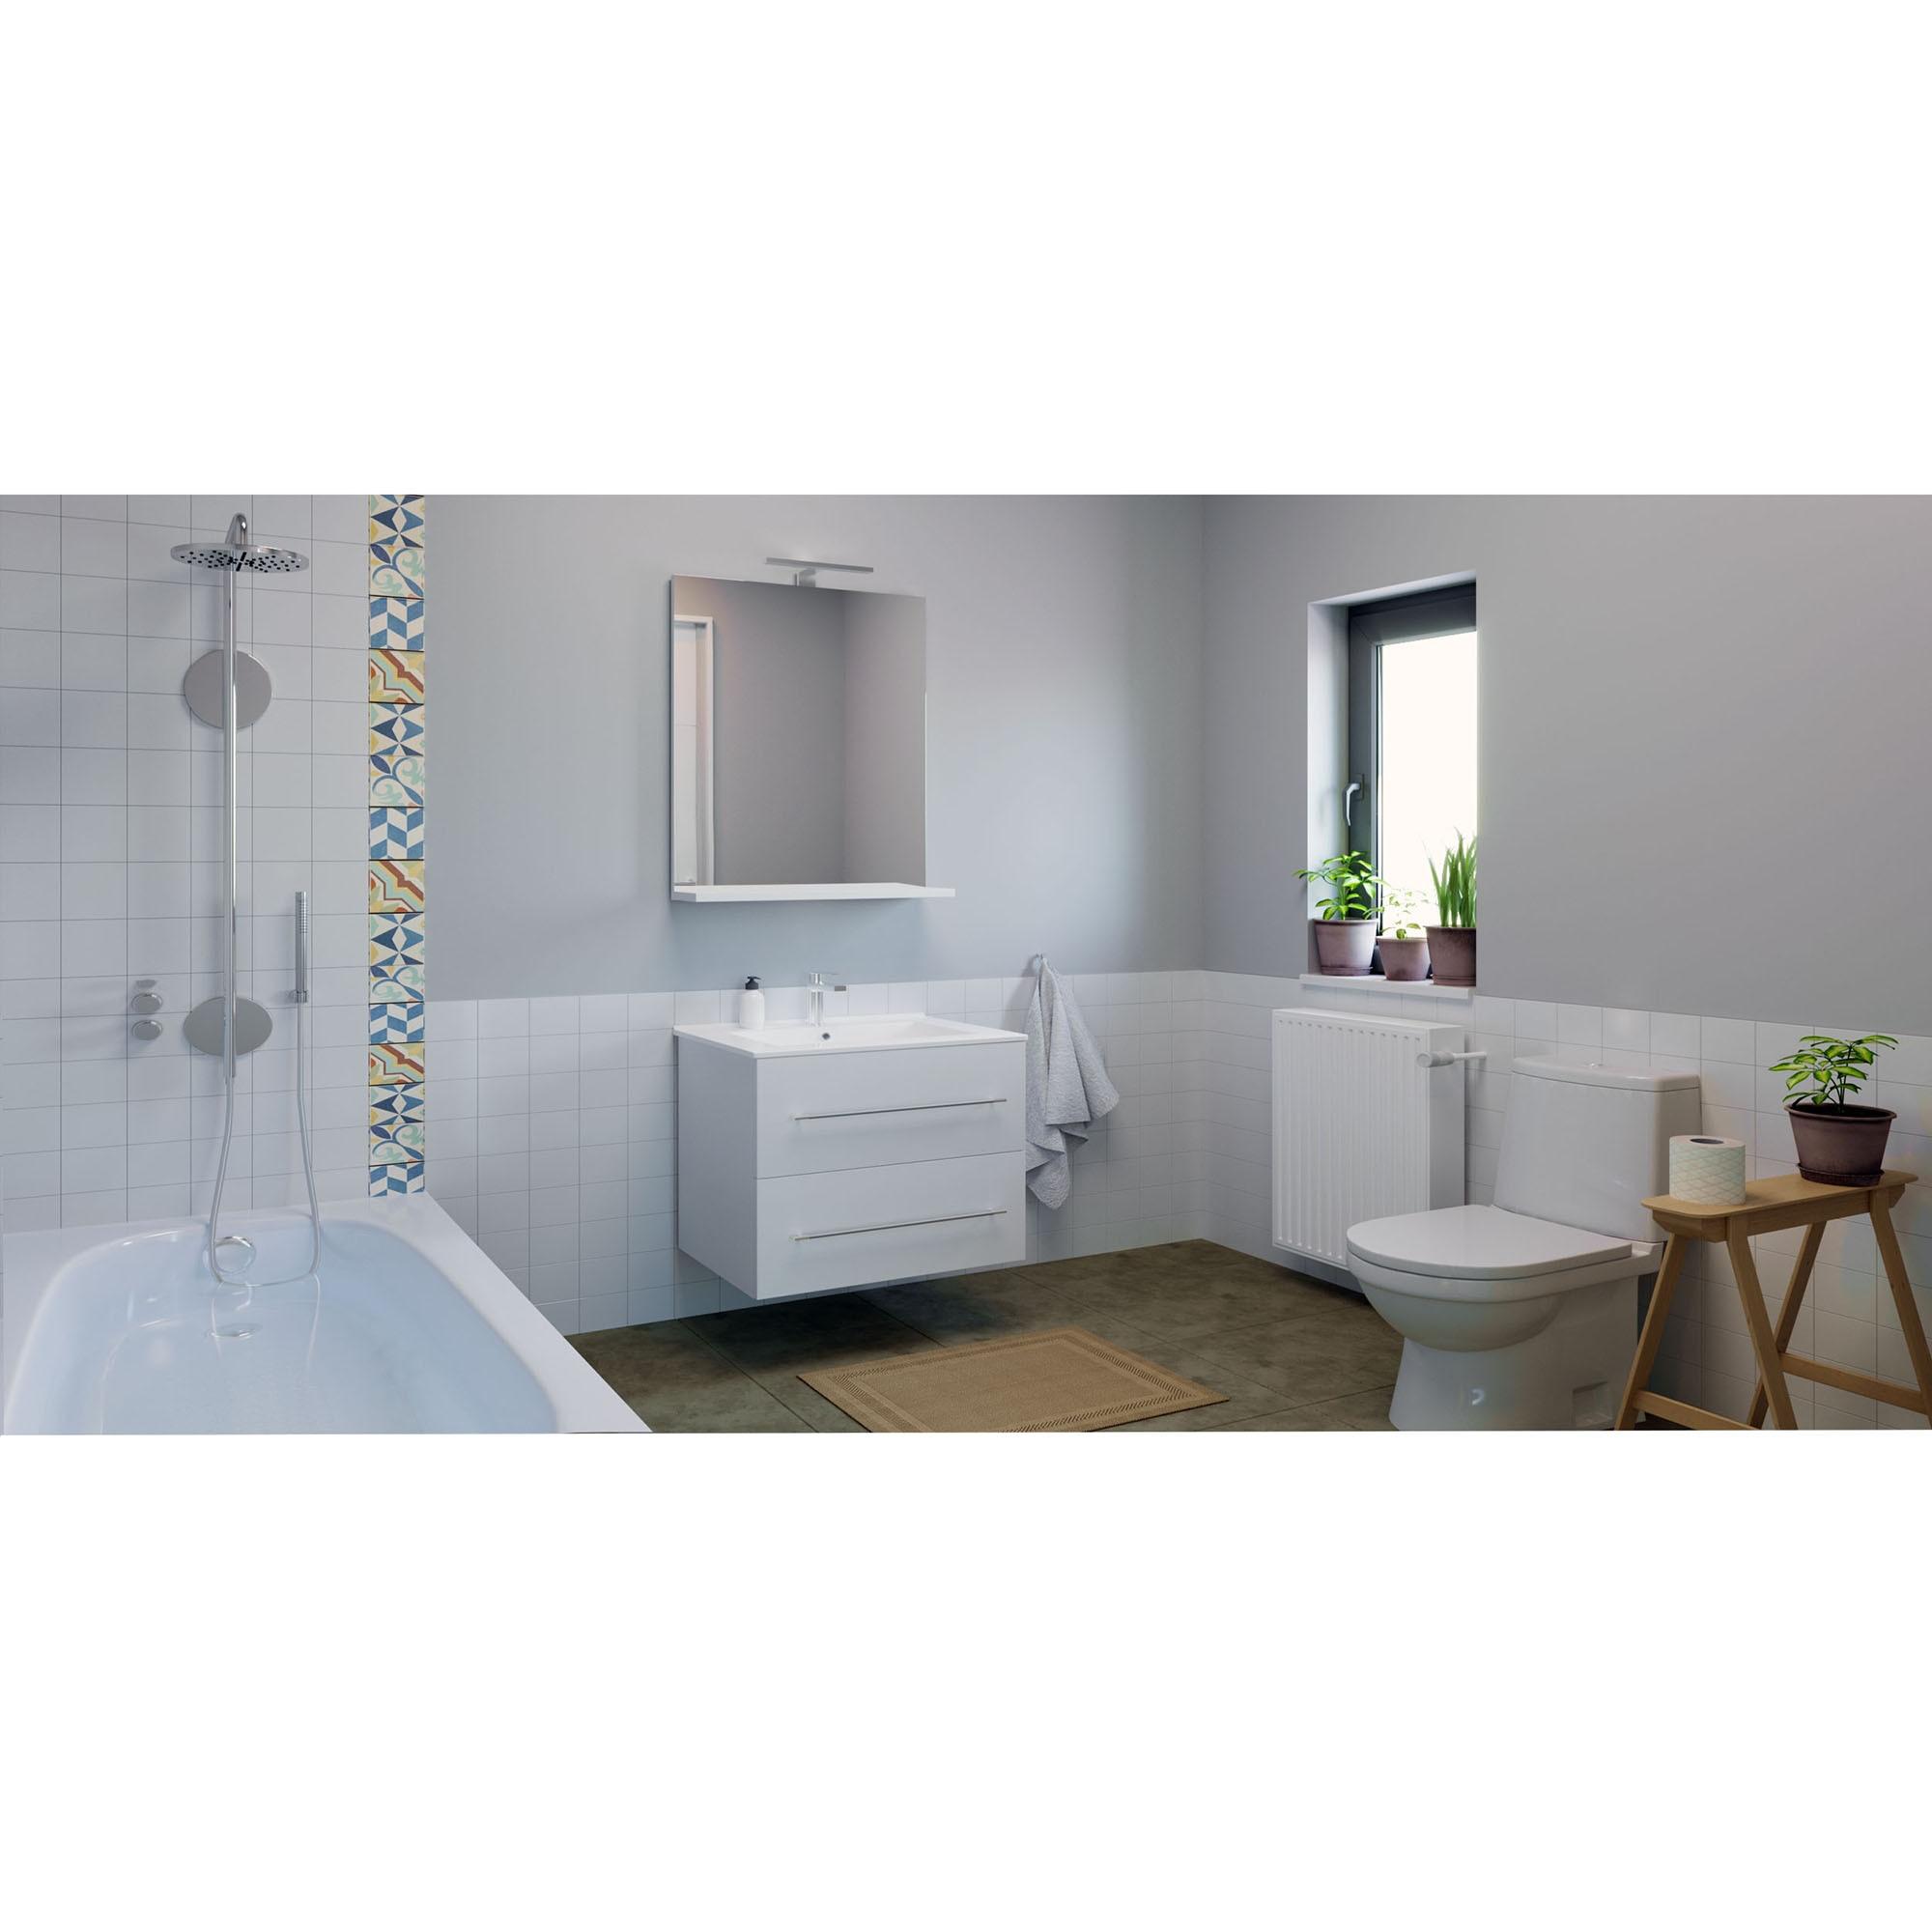 Fotografie Baza mobilier si lavoar Badenmob 054, suspendat, sertare, alb, 60 cm